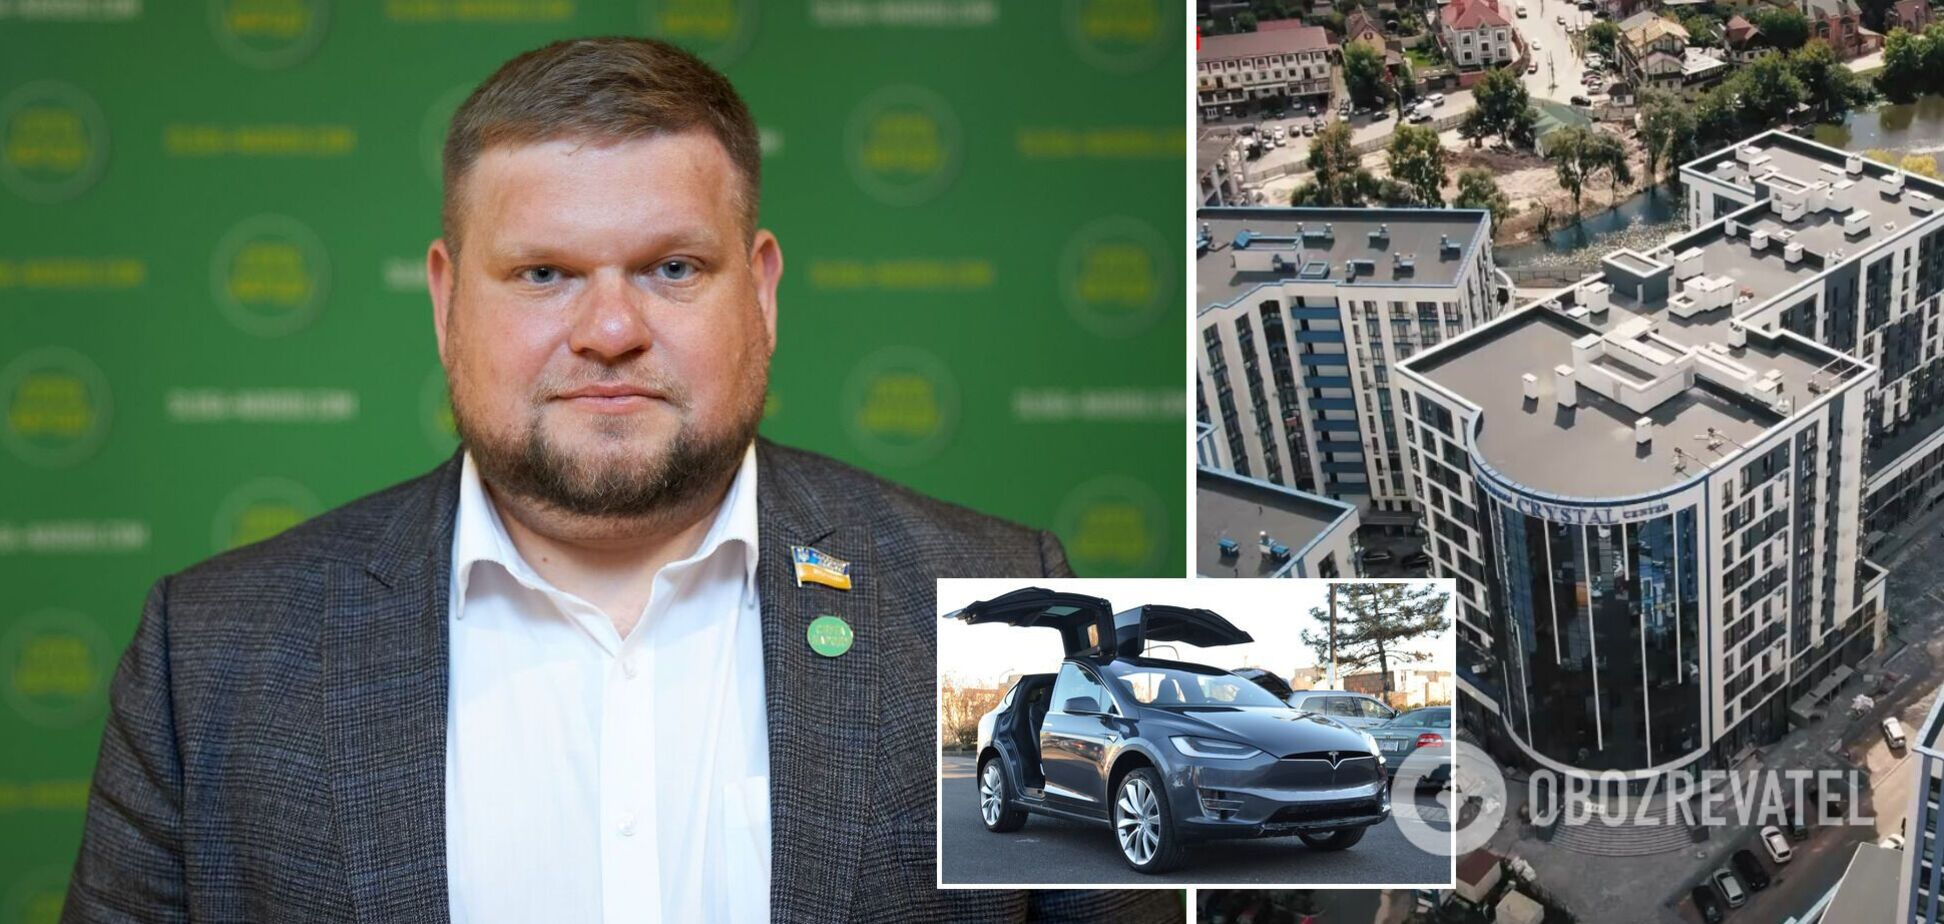 Мать нардепа из 'Слуги народа' Клочко за два года приобрела имущества на 14 млн грн. Видео